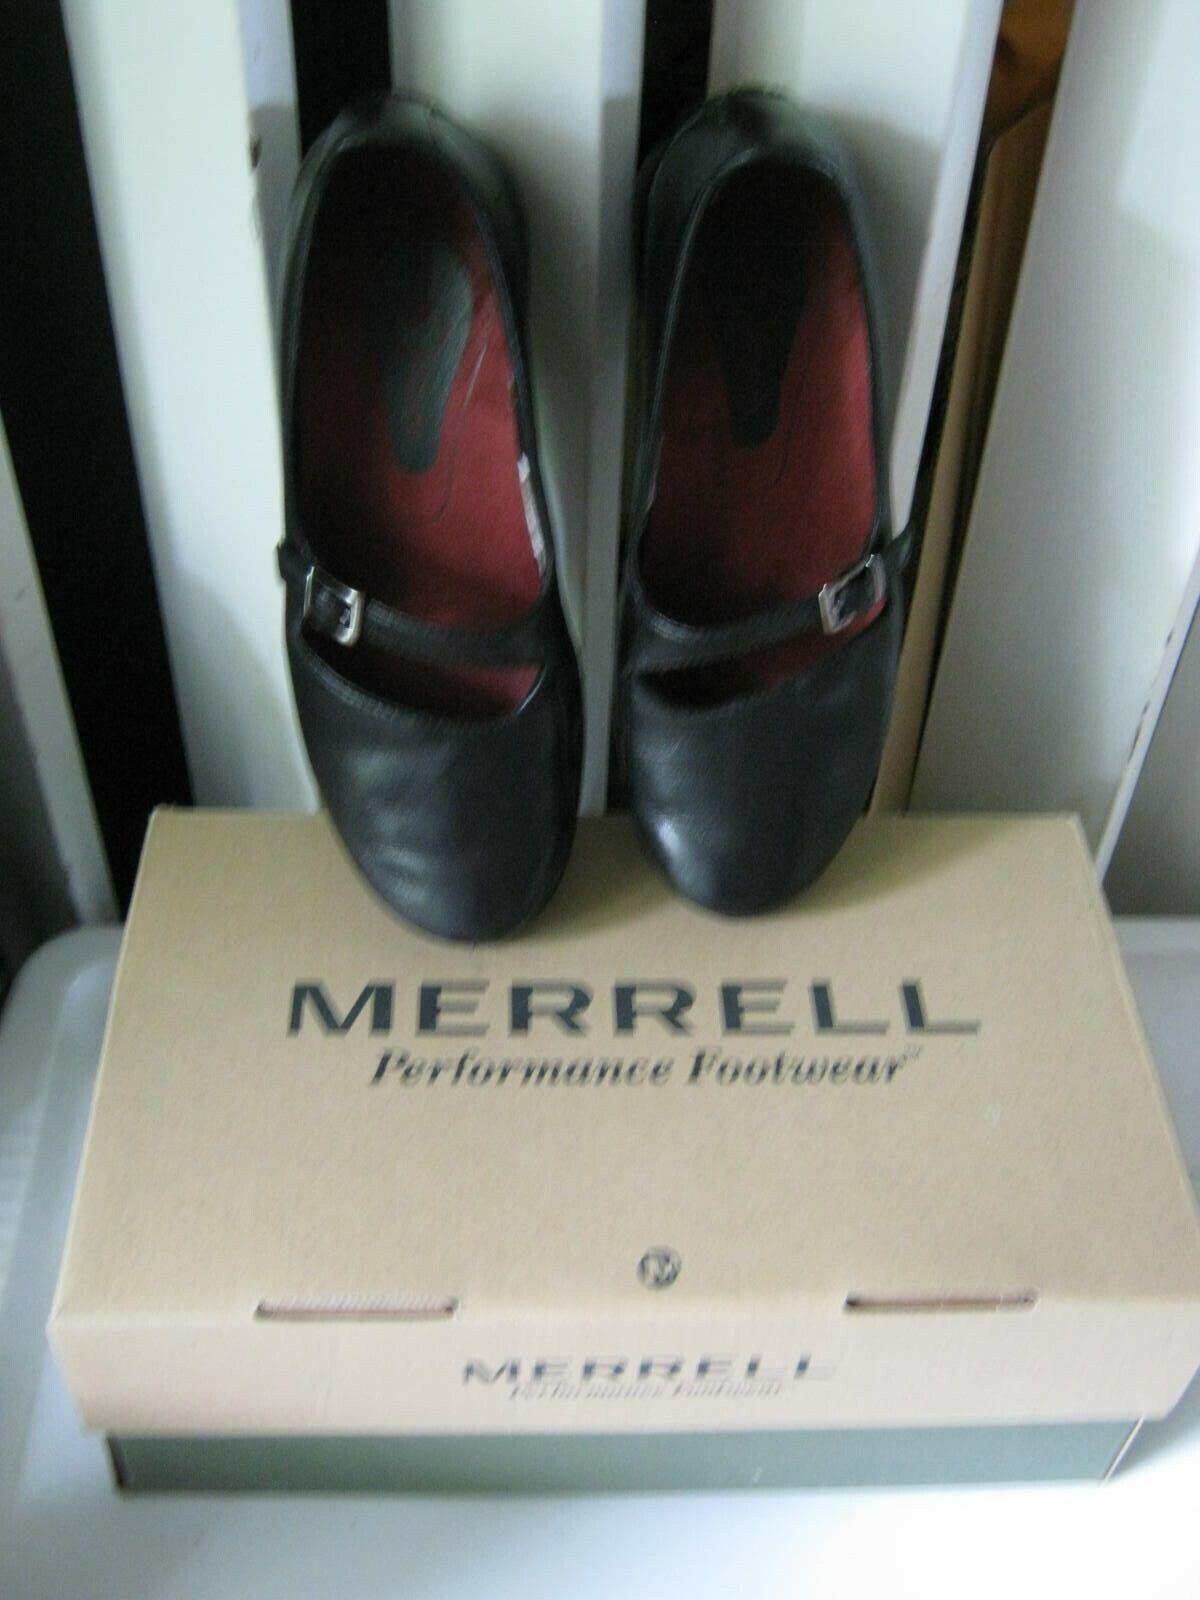 vendita outlet Merrell Performance Performance Performance Footwear nero scarpe Mary Jane Spire Emme Dimensione 6M  moda